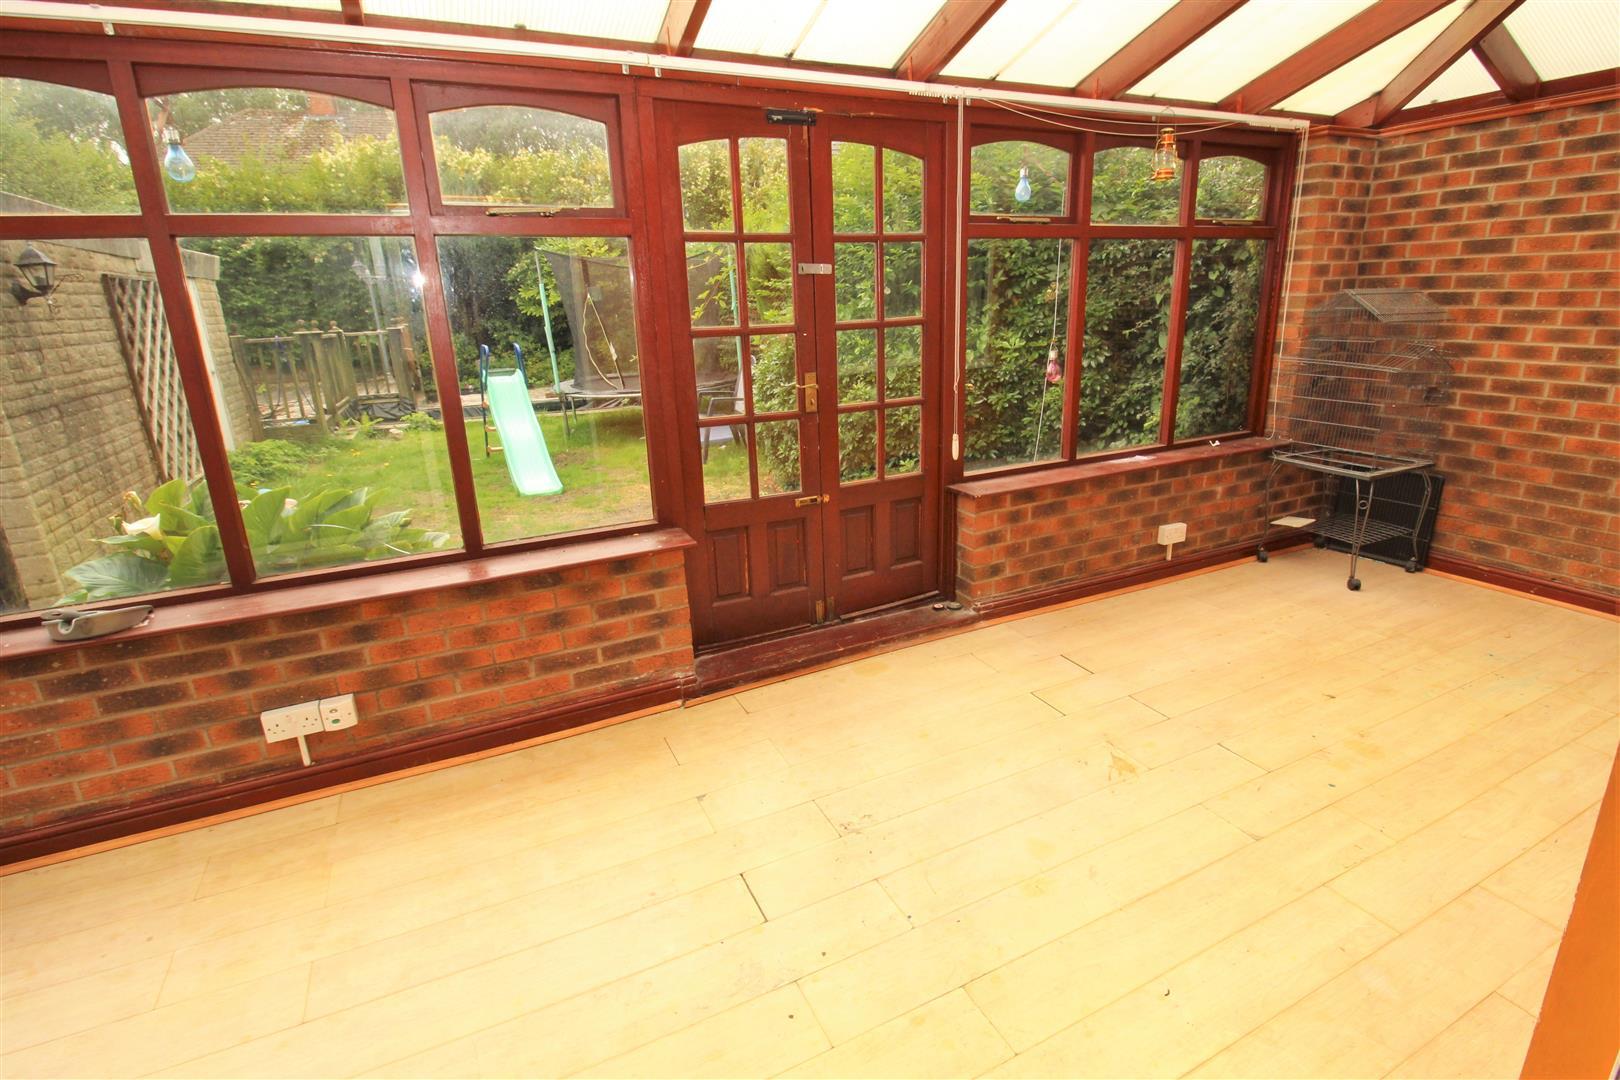 3 Bedrooms, House - Semi-Detached, Emerald Close, Old Roan